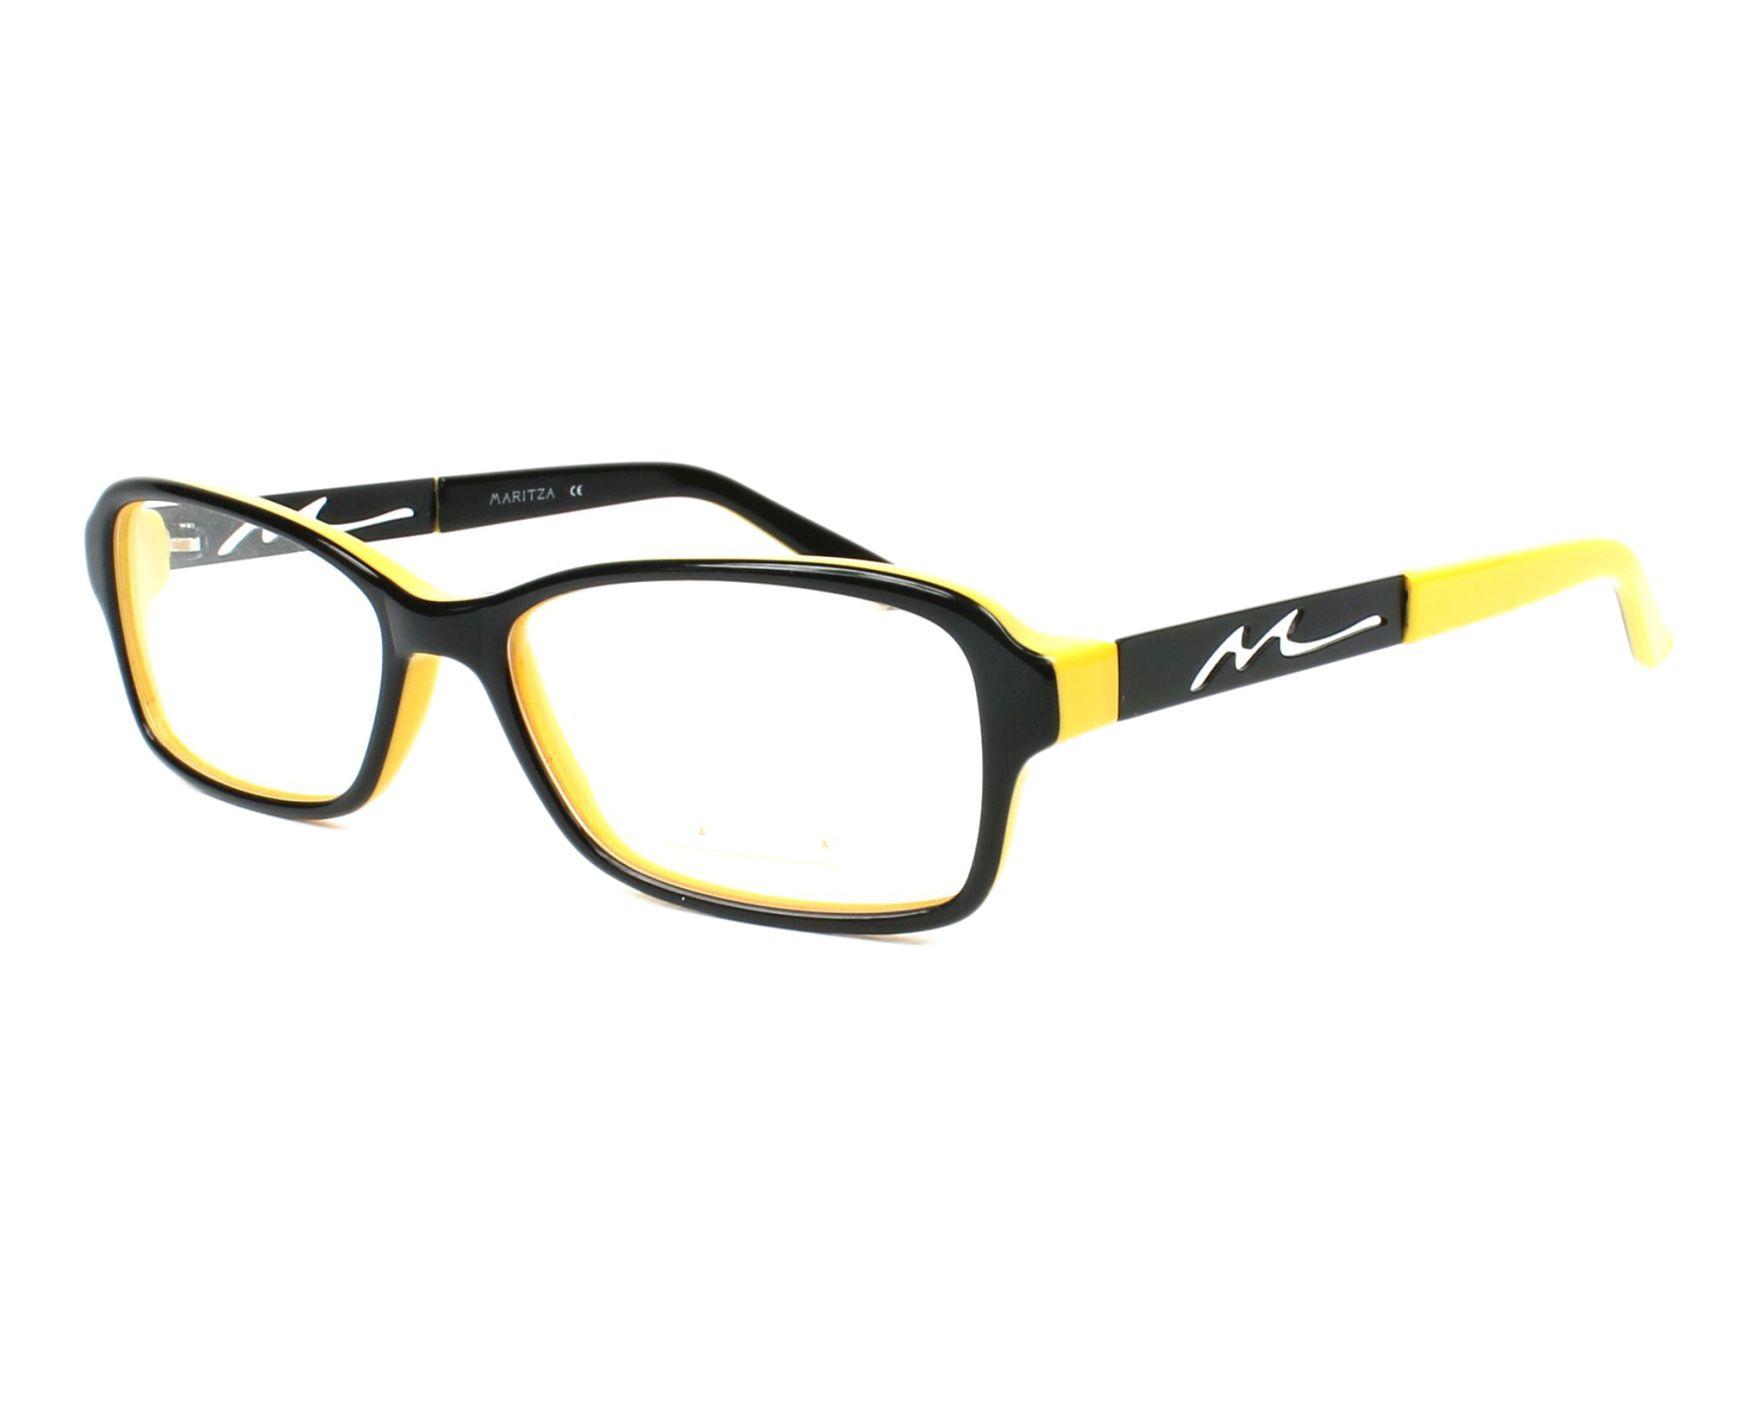 order your maritza eyeglasses m 0185 blj 51 today